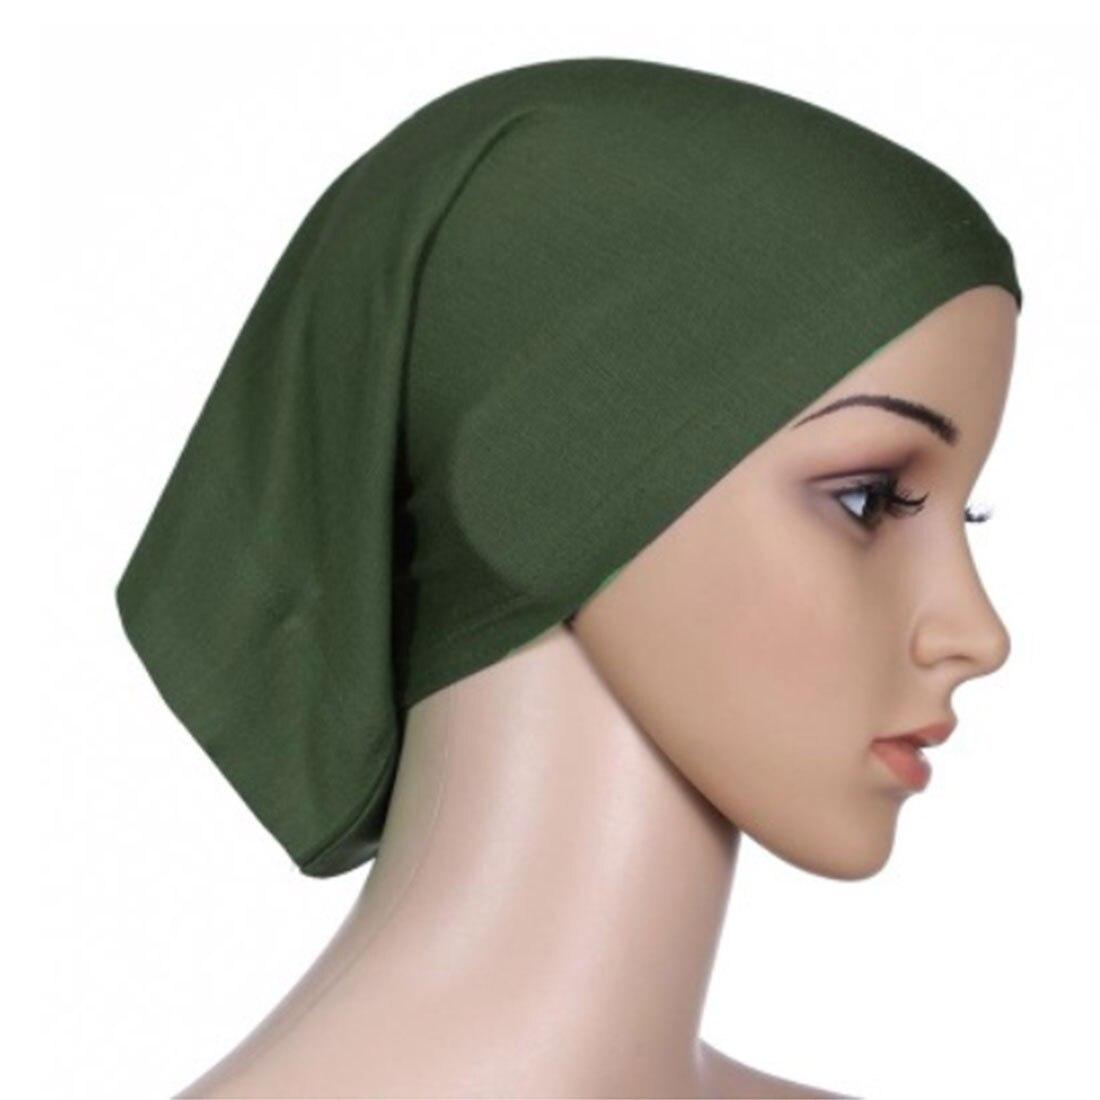 Women  Full Cover Muslim Headscarf Islamic Head Wear Underscarf Shawls Hijabs Solid Colors women Plain